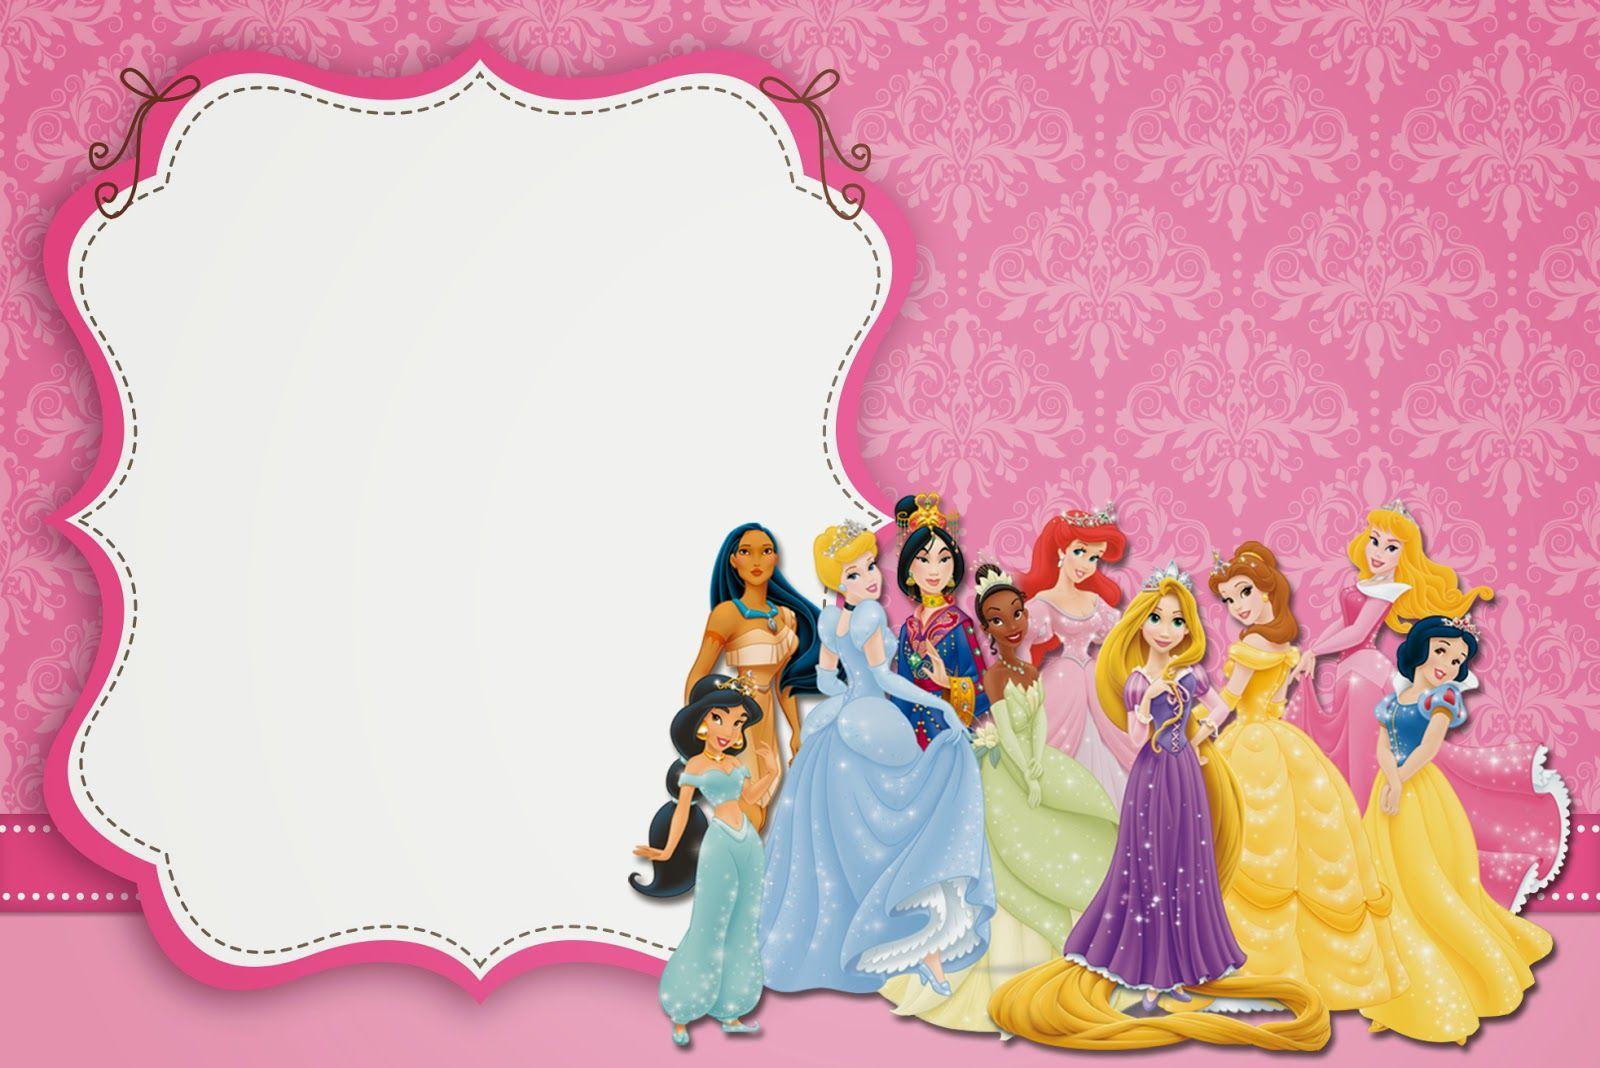 disney princess party free printable